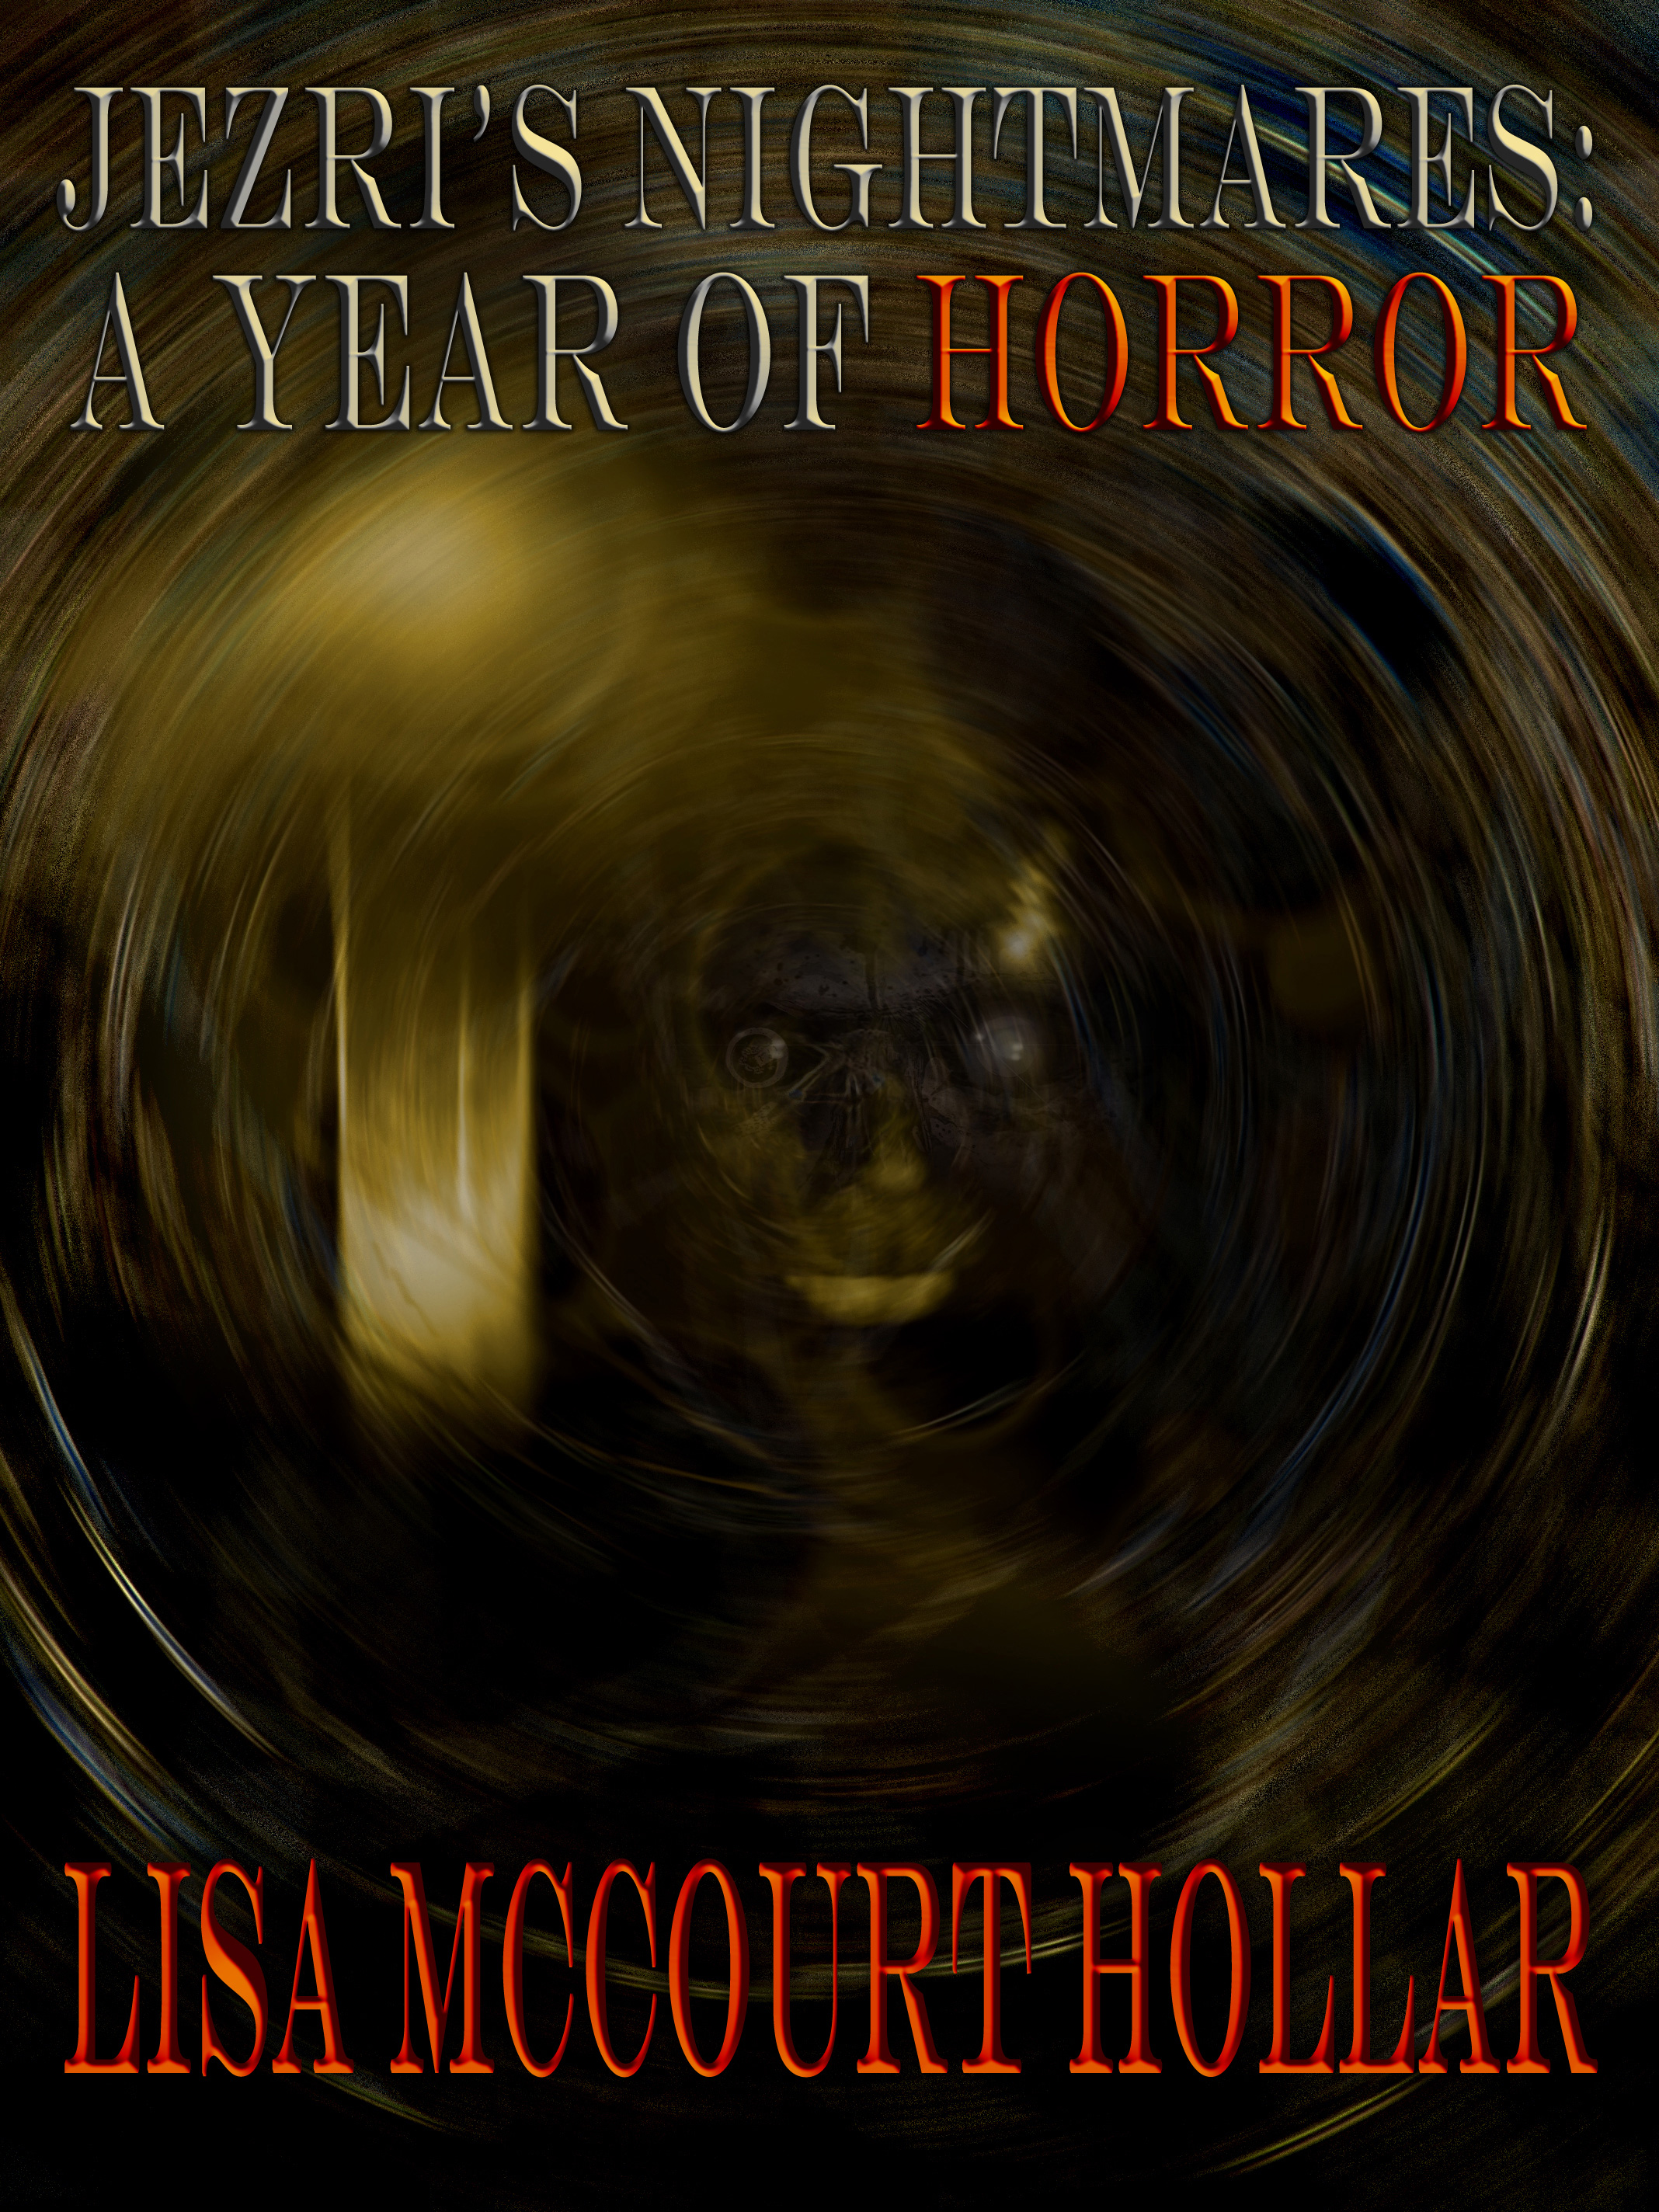 Tales of Terror (Jezris Nightmares Book 2)